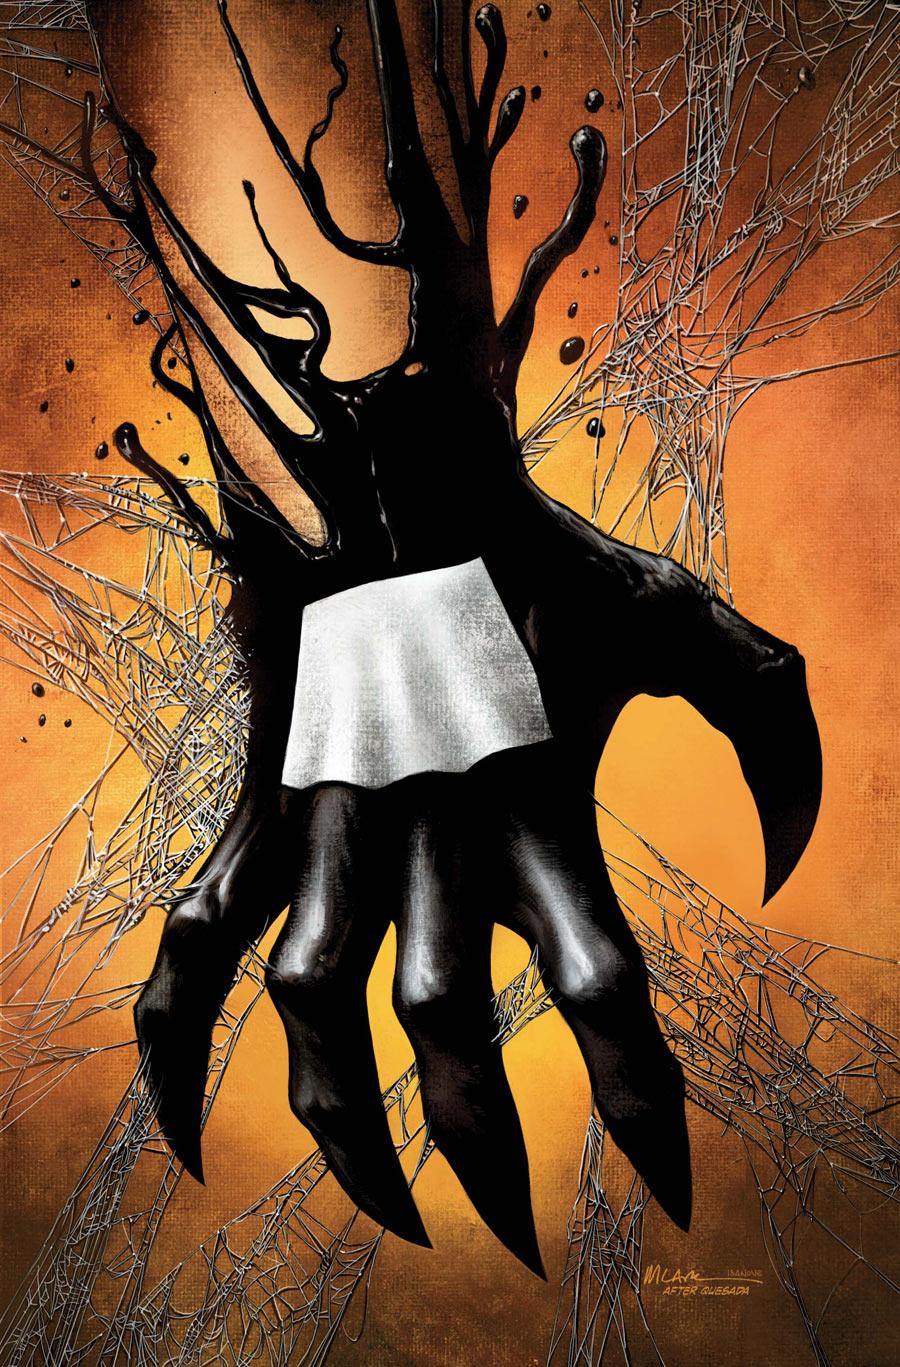 Venom Vol 2 9 Michael Lark Variant Textless.jpg